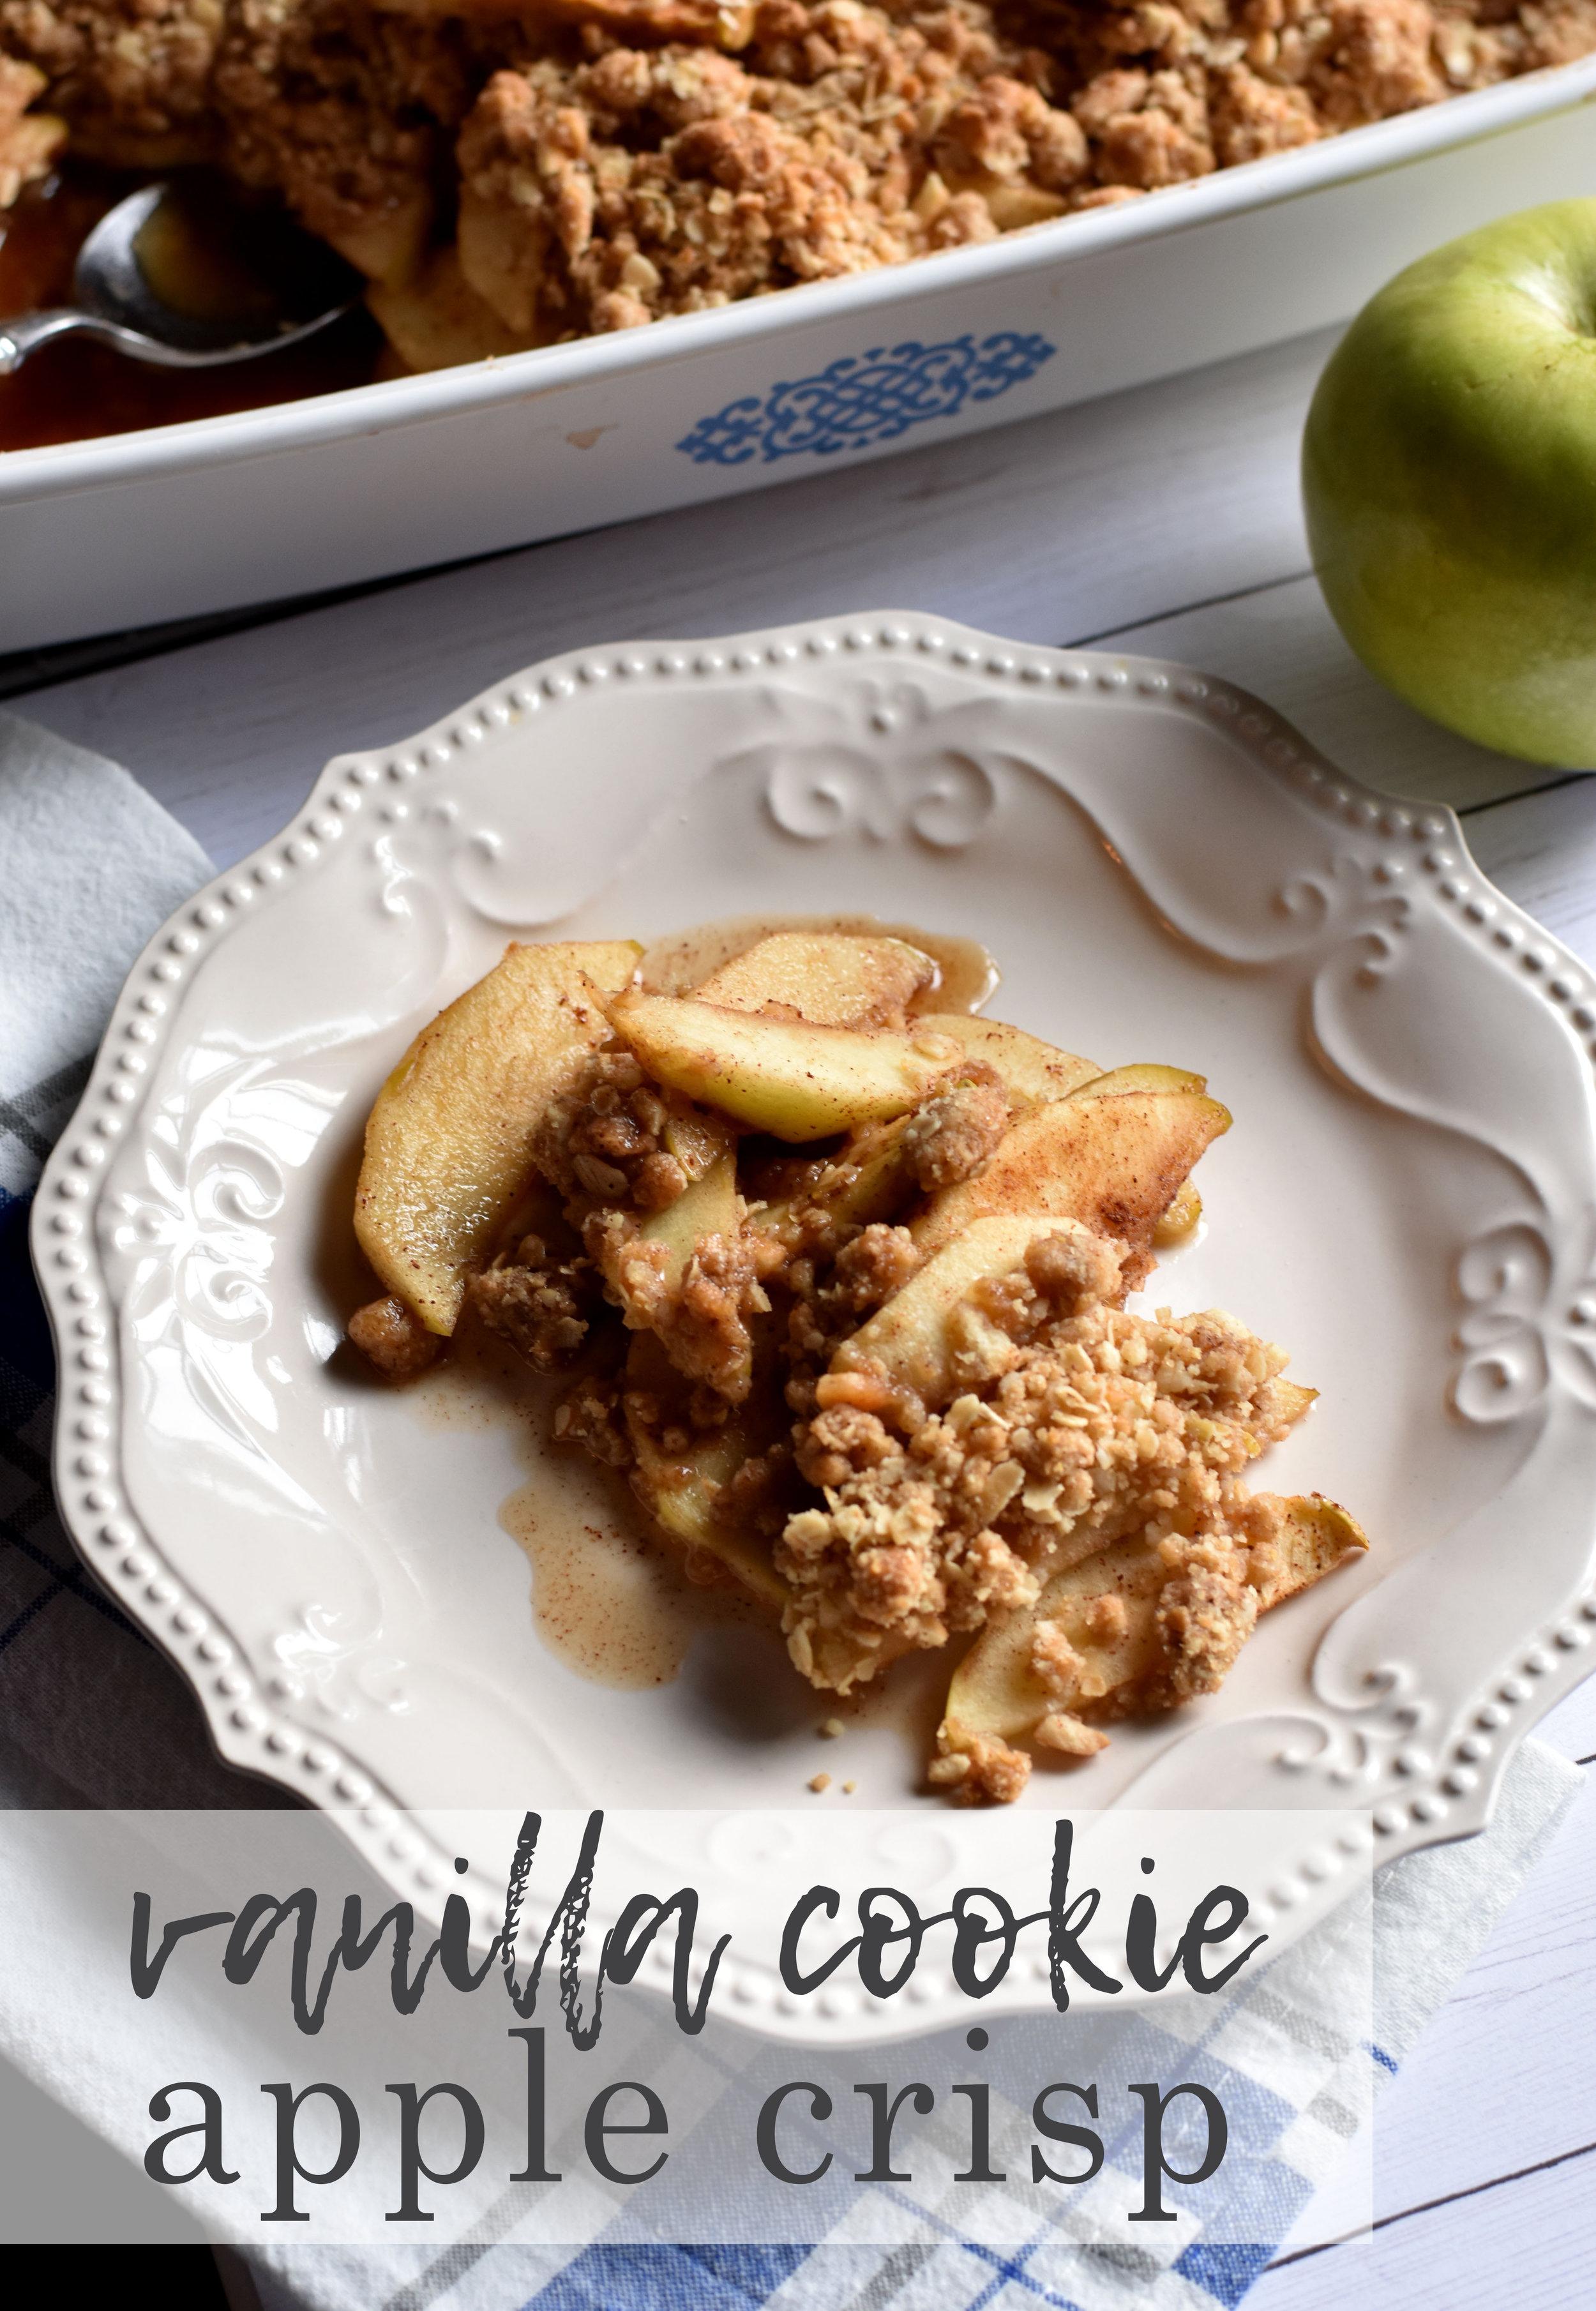 Vanilla Cookie Apple Crisp Pinterest Graphic.jpg